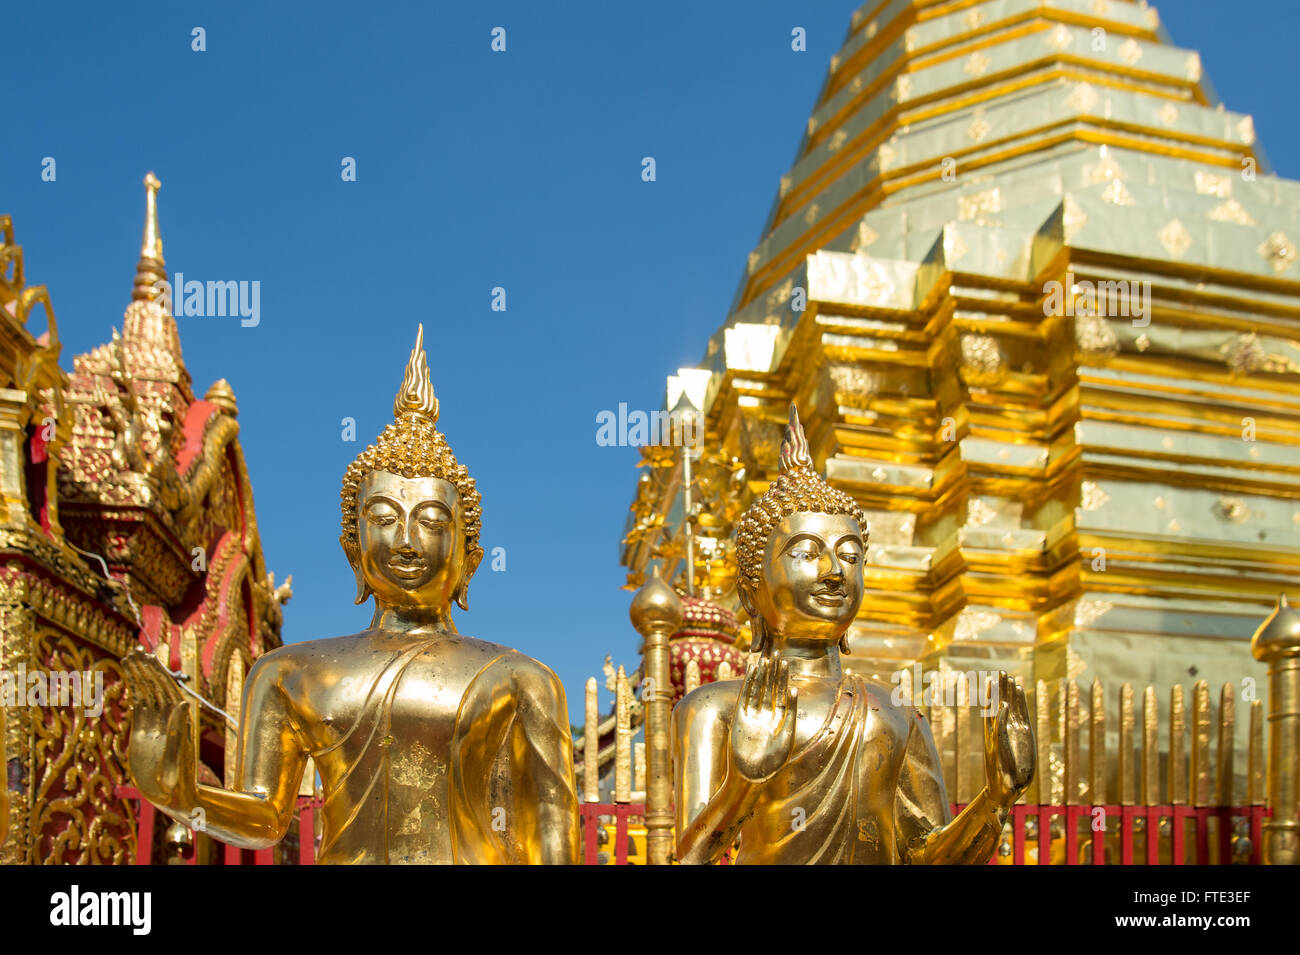 Wat Phra That Doi Suthep à Chiang Mai, Thaïlande Photo Stock